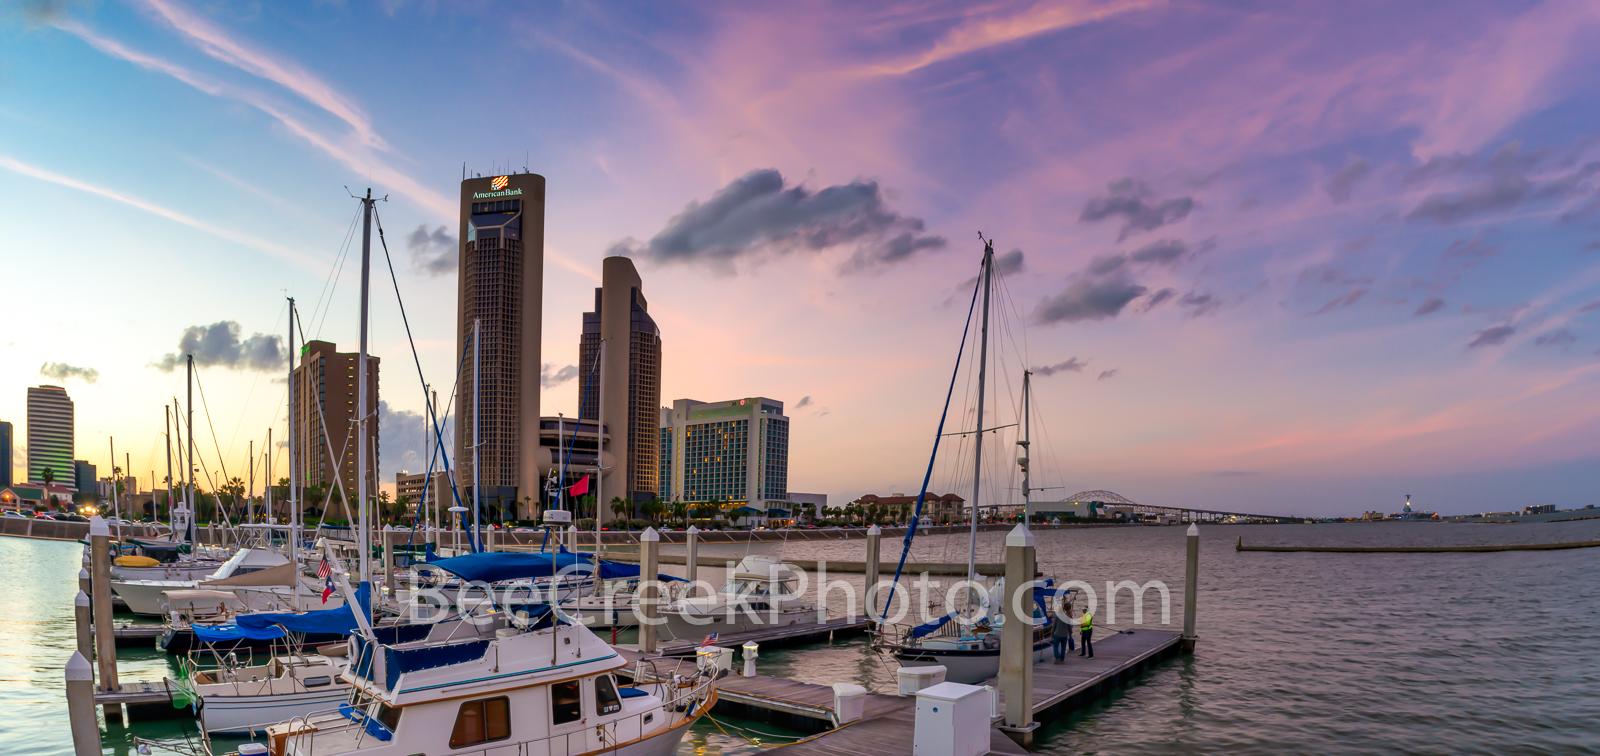 Corpus Christi, skyline, corpus skyline, city, sunset, marina, bay, harbor bridge, water, boats, dusk, panorama, pano, sailboats, dock, seascape, oceanscape, clouds, colorful skies, battleship, bridge, photo